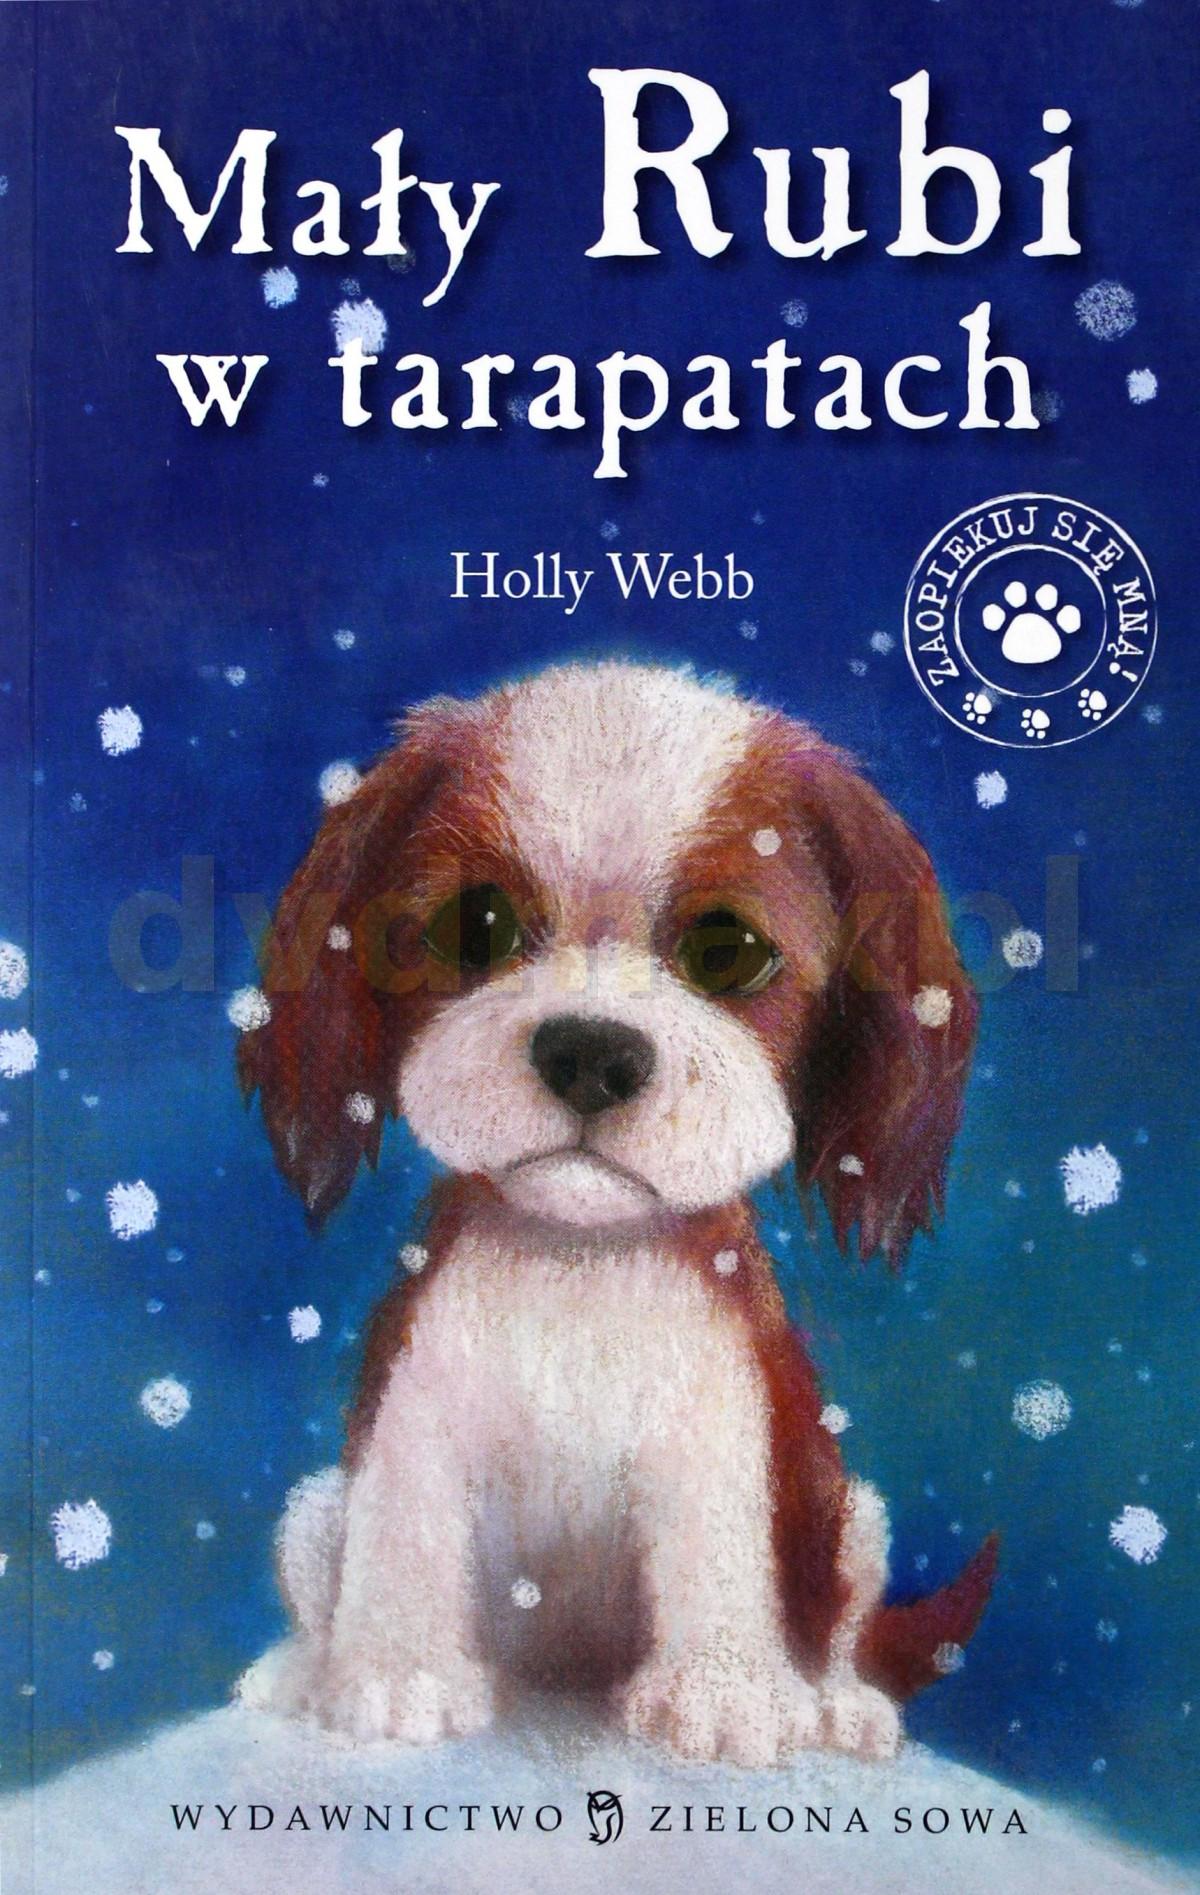 Mały Rubi w Tarapatach - Holly Webb [KSIĄŻKA] - Holly Webb